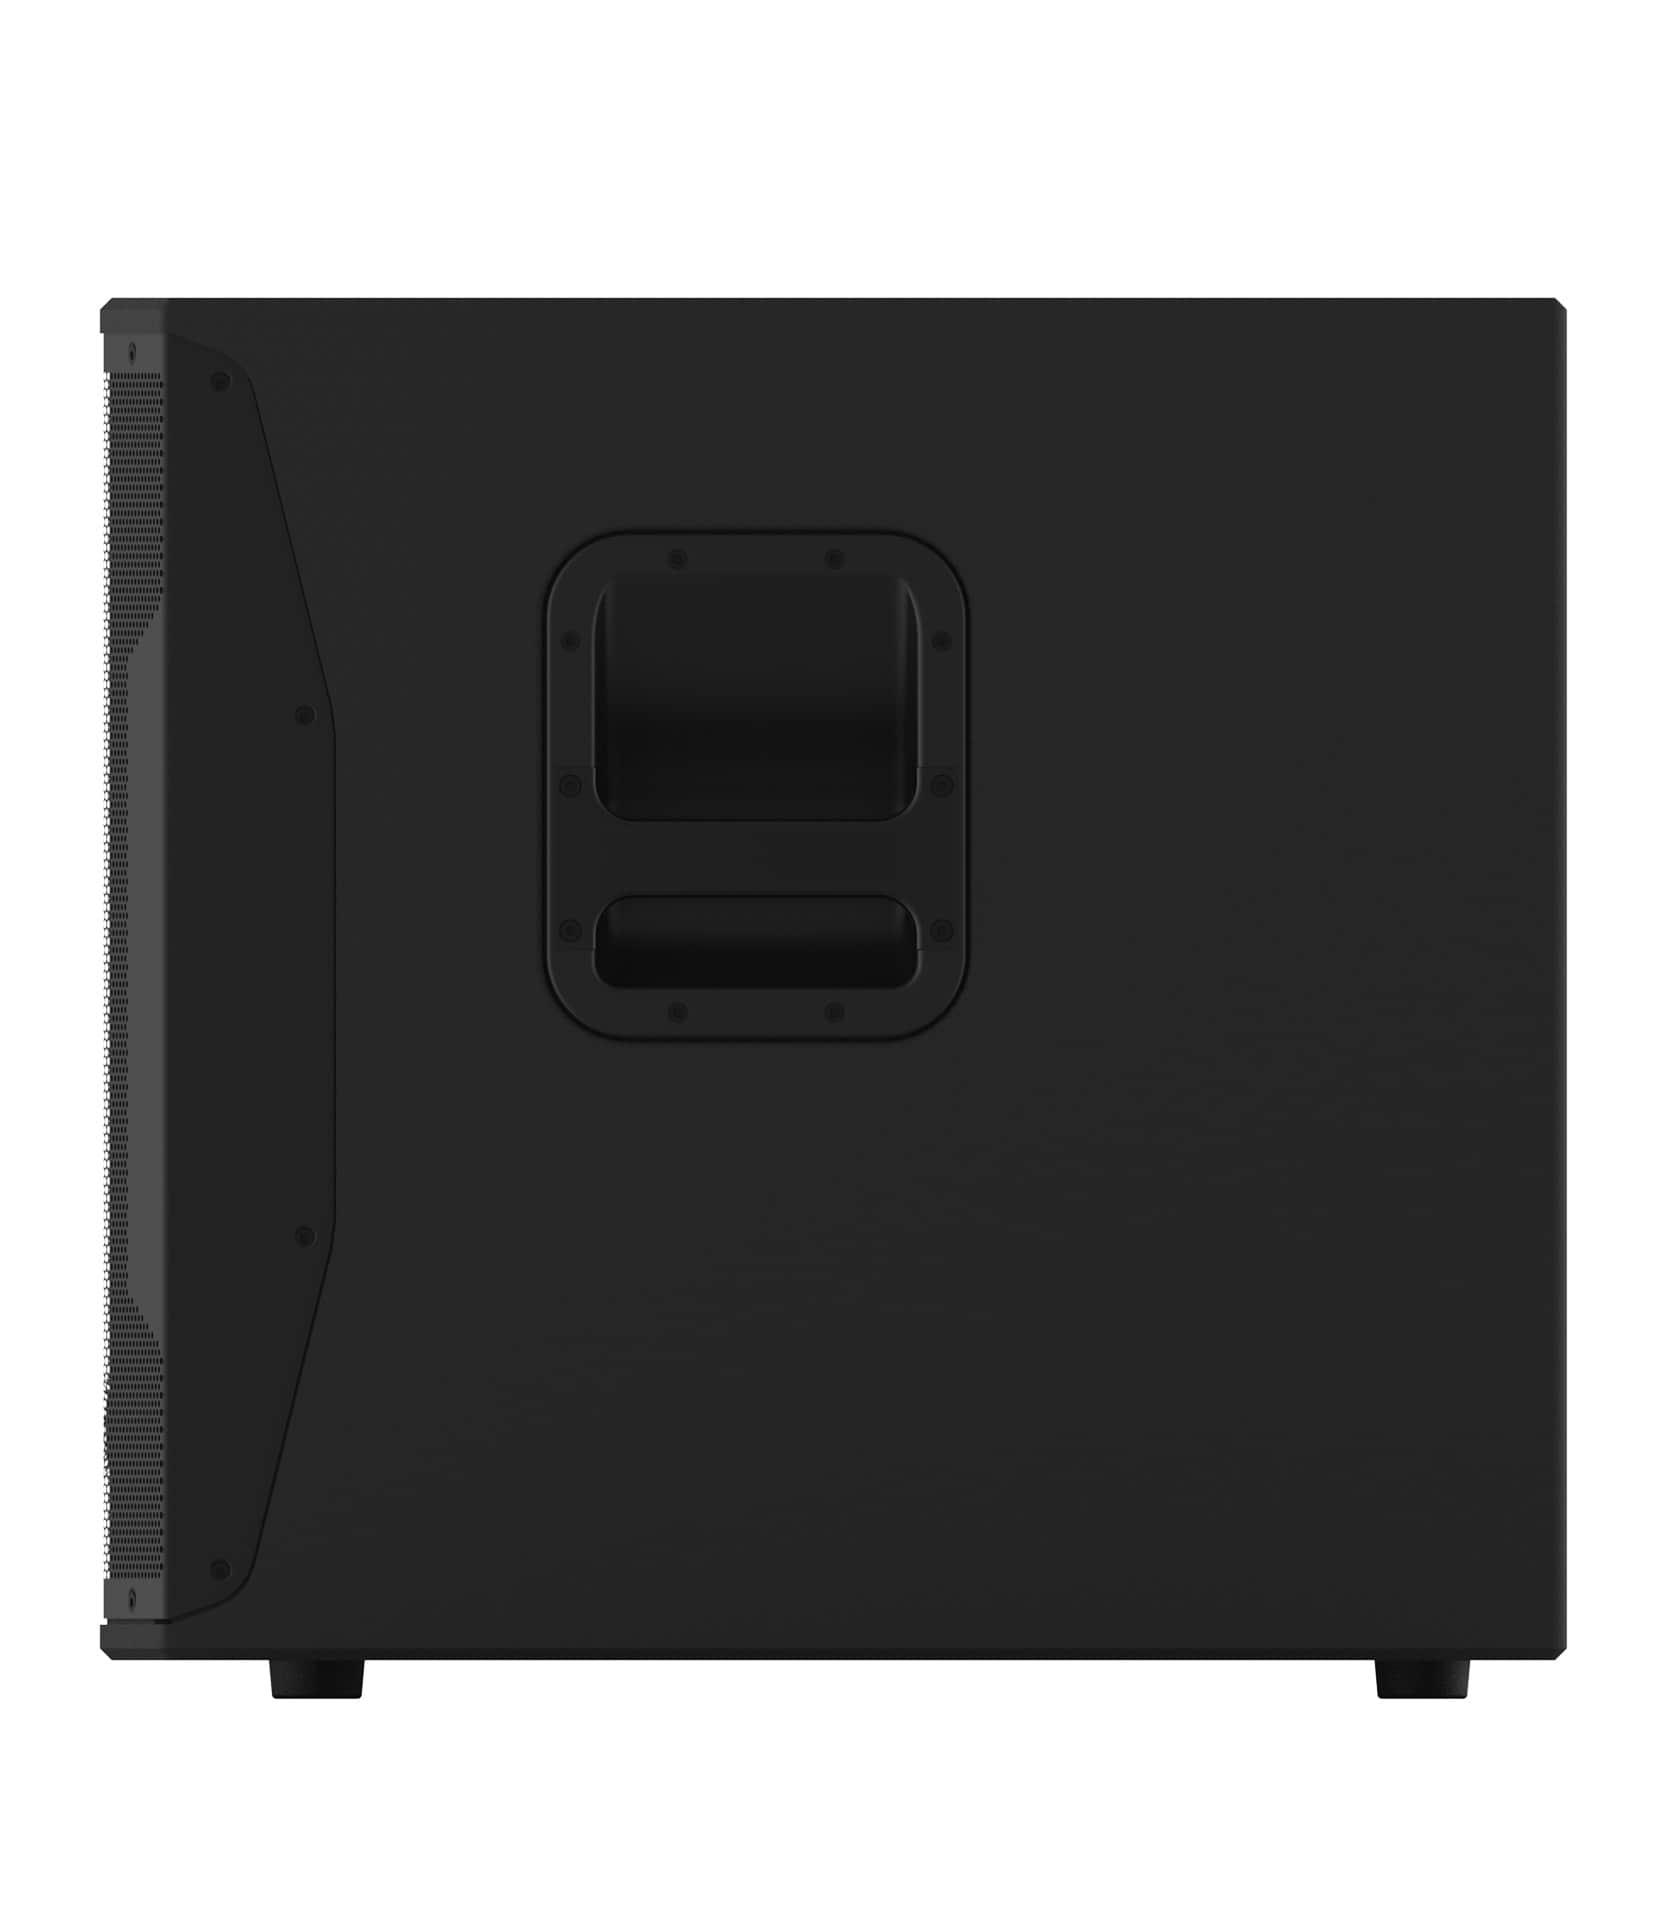 SRM1850 1600W 18 Powered Subwoofer - Buy Online